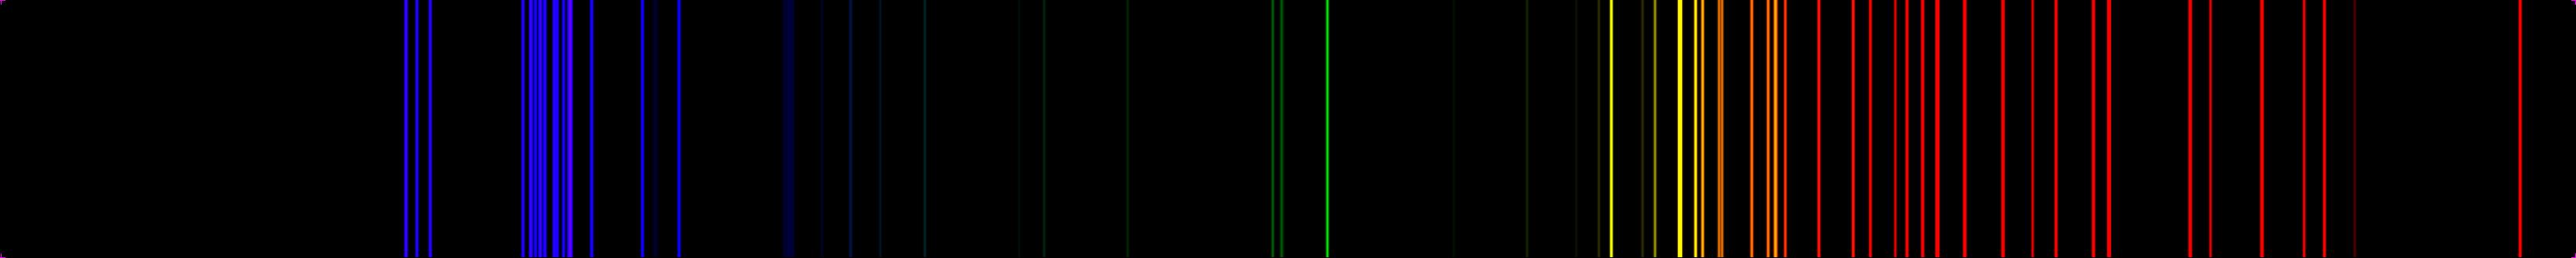 The Emission Spectra of Various Atoms for Argon Spectrum  155fiz